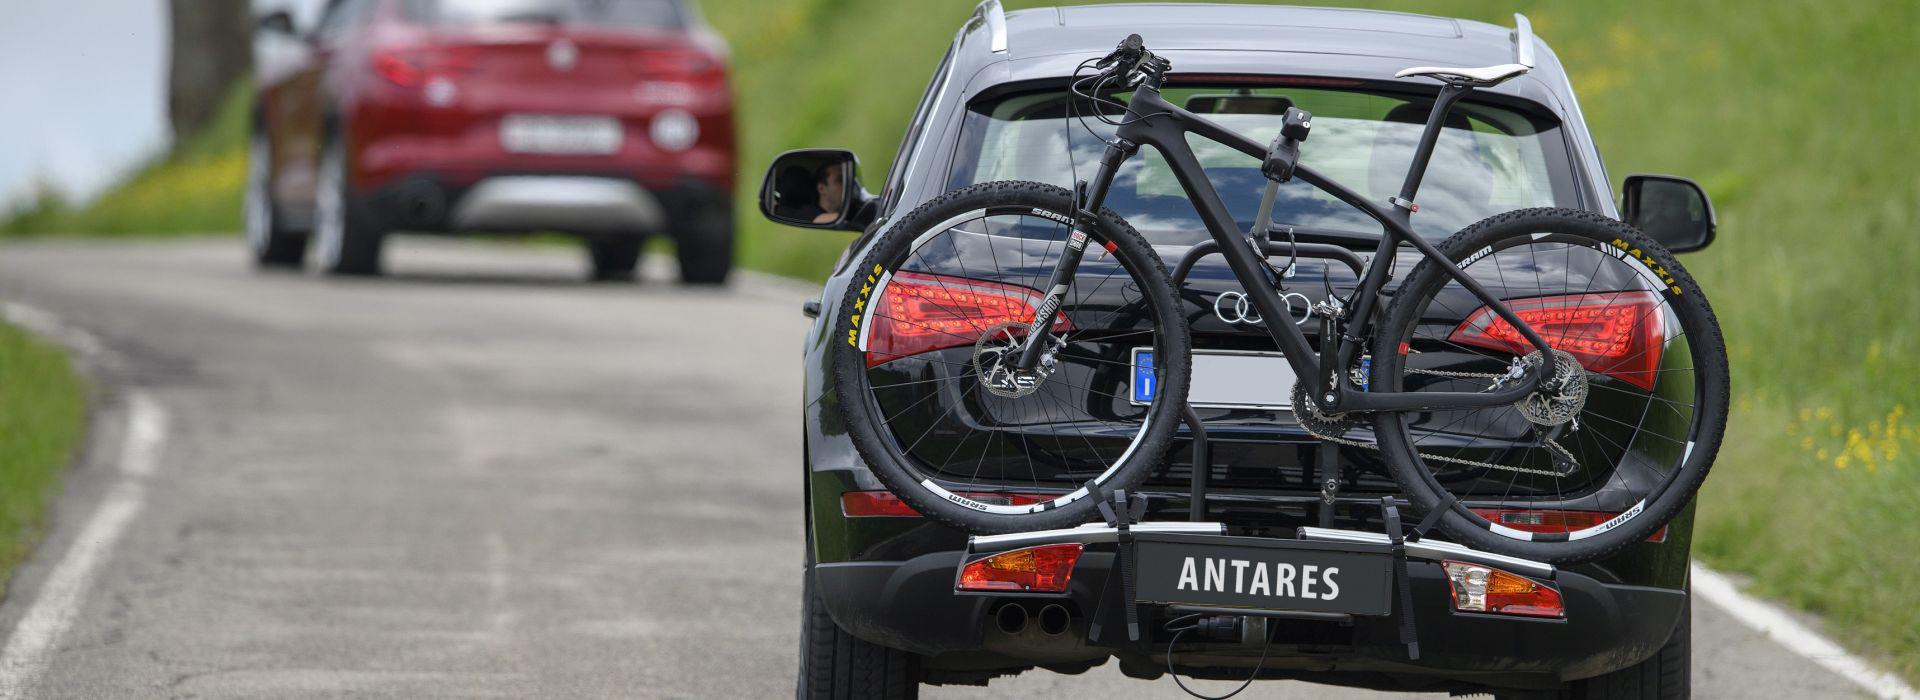 Towbar Mounted Bike Carriers